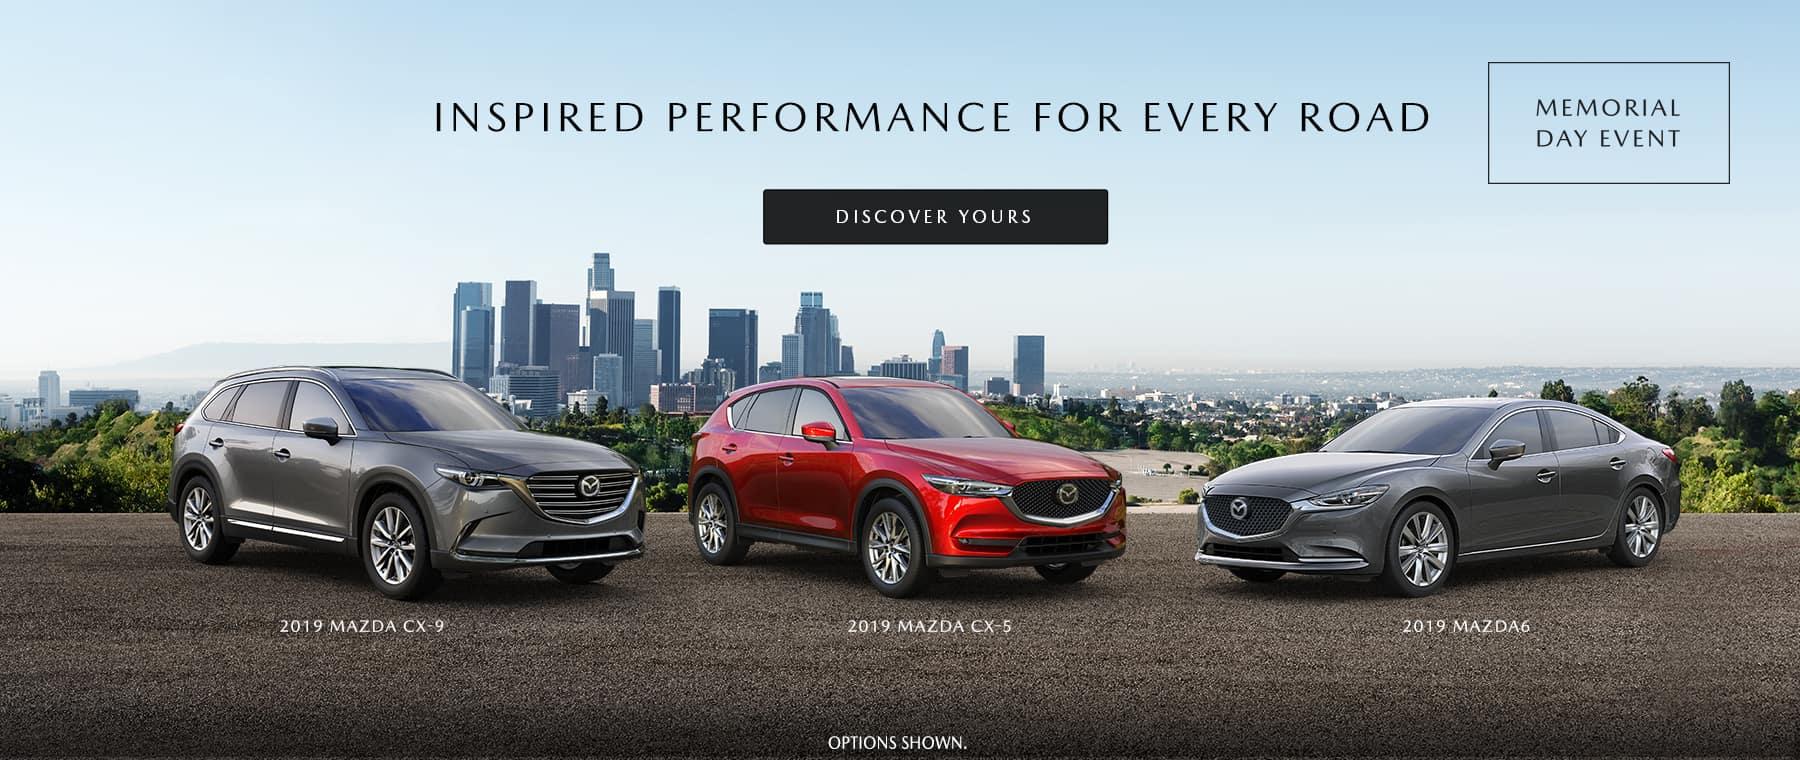 Mazda Memorial Day Event at Liberty Mazda